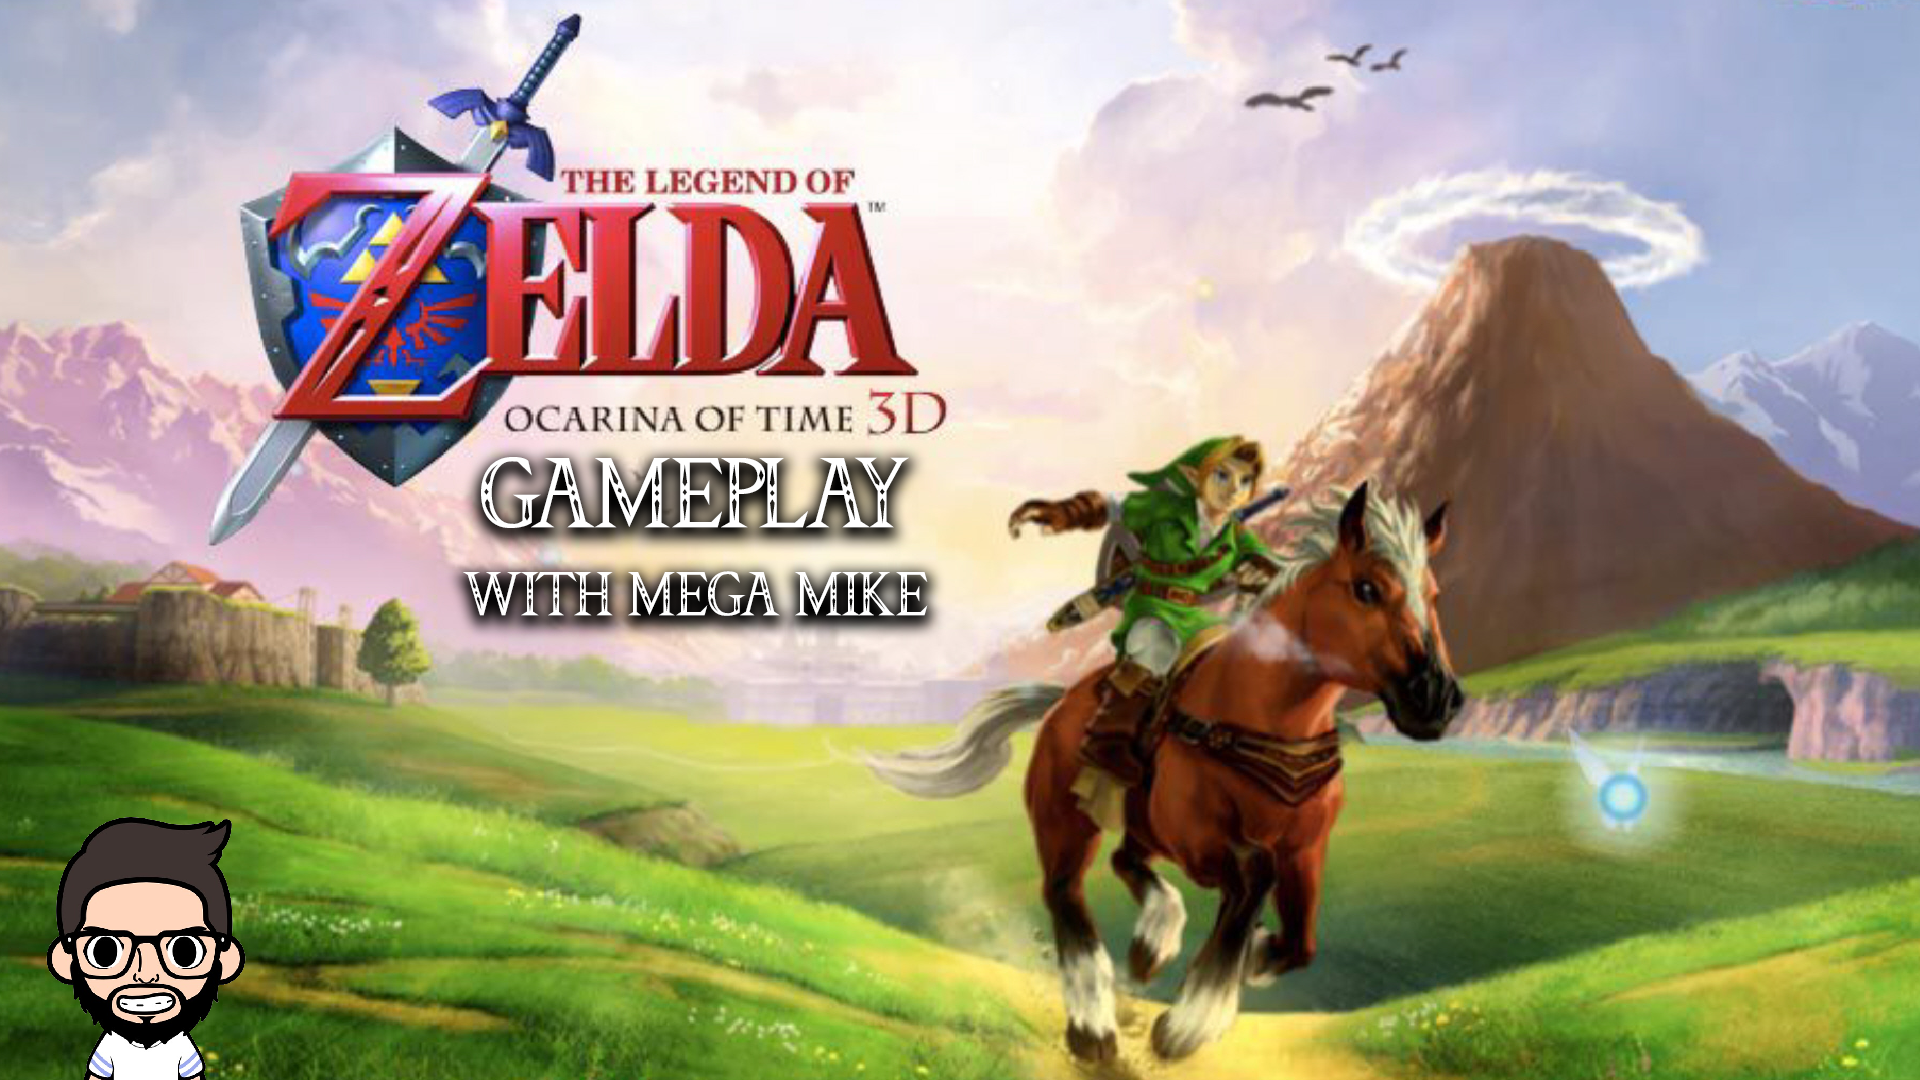 Watch Clip The Legend Of Zelda Ocarina Of Time Prime Video